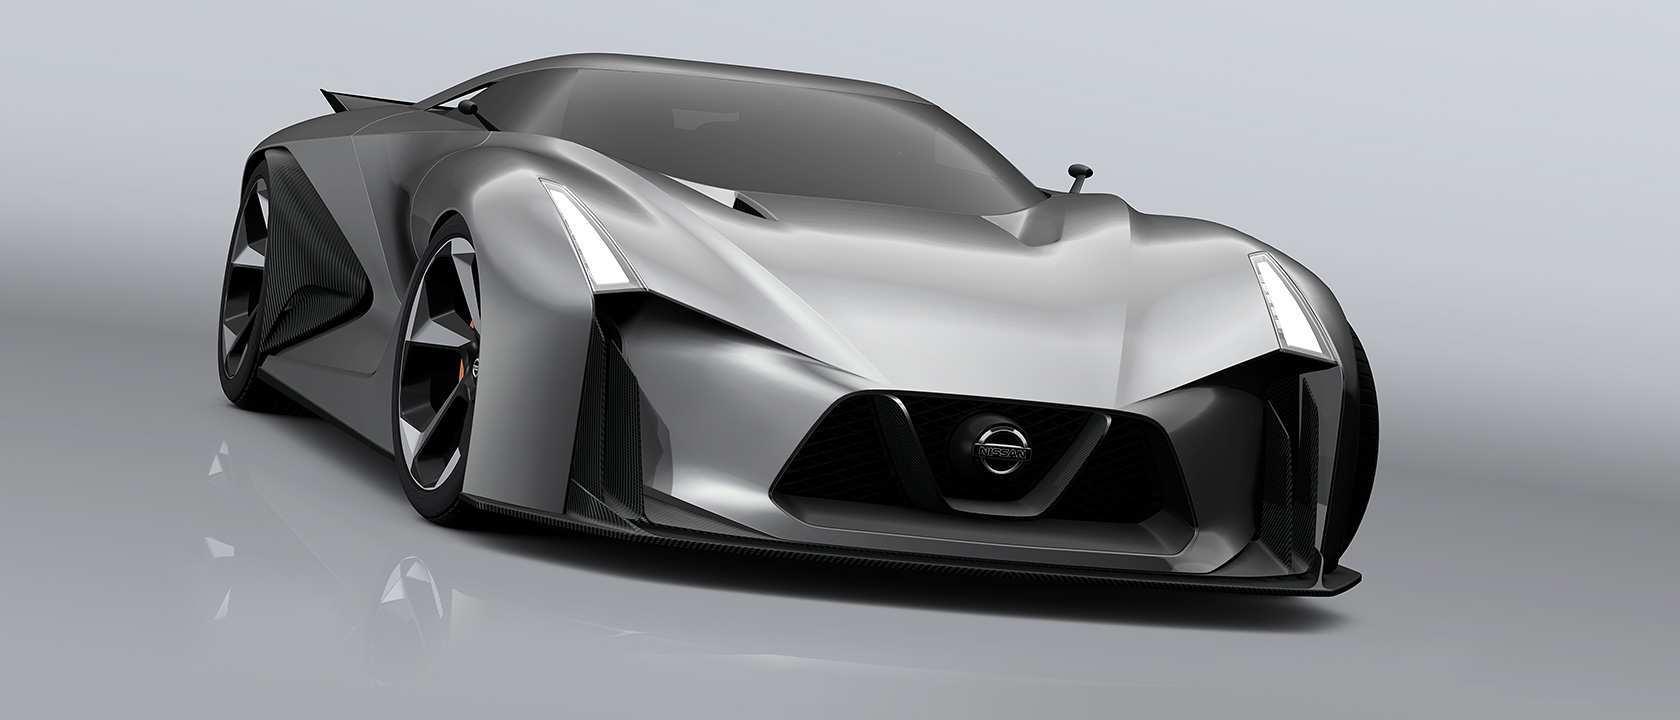 35 Great 2020 Nissan Gran Turismo Spy Shoot by 2020 Nissan Gran Turismo